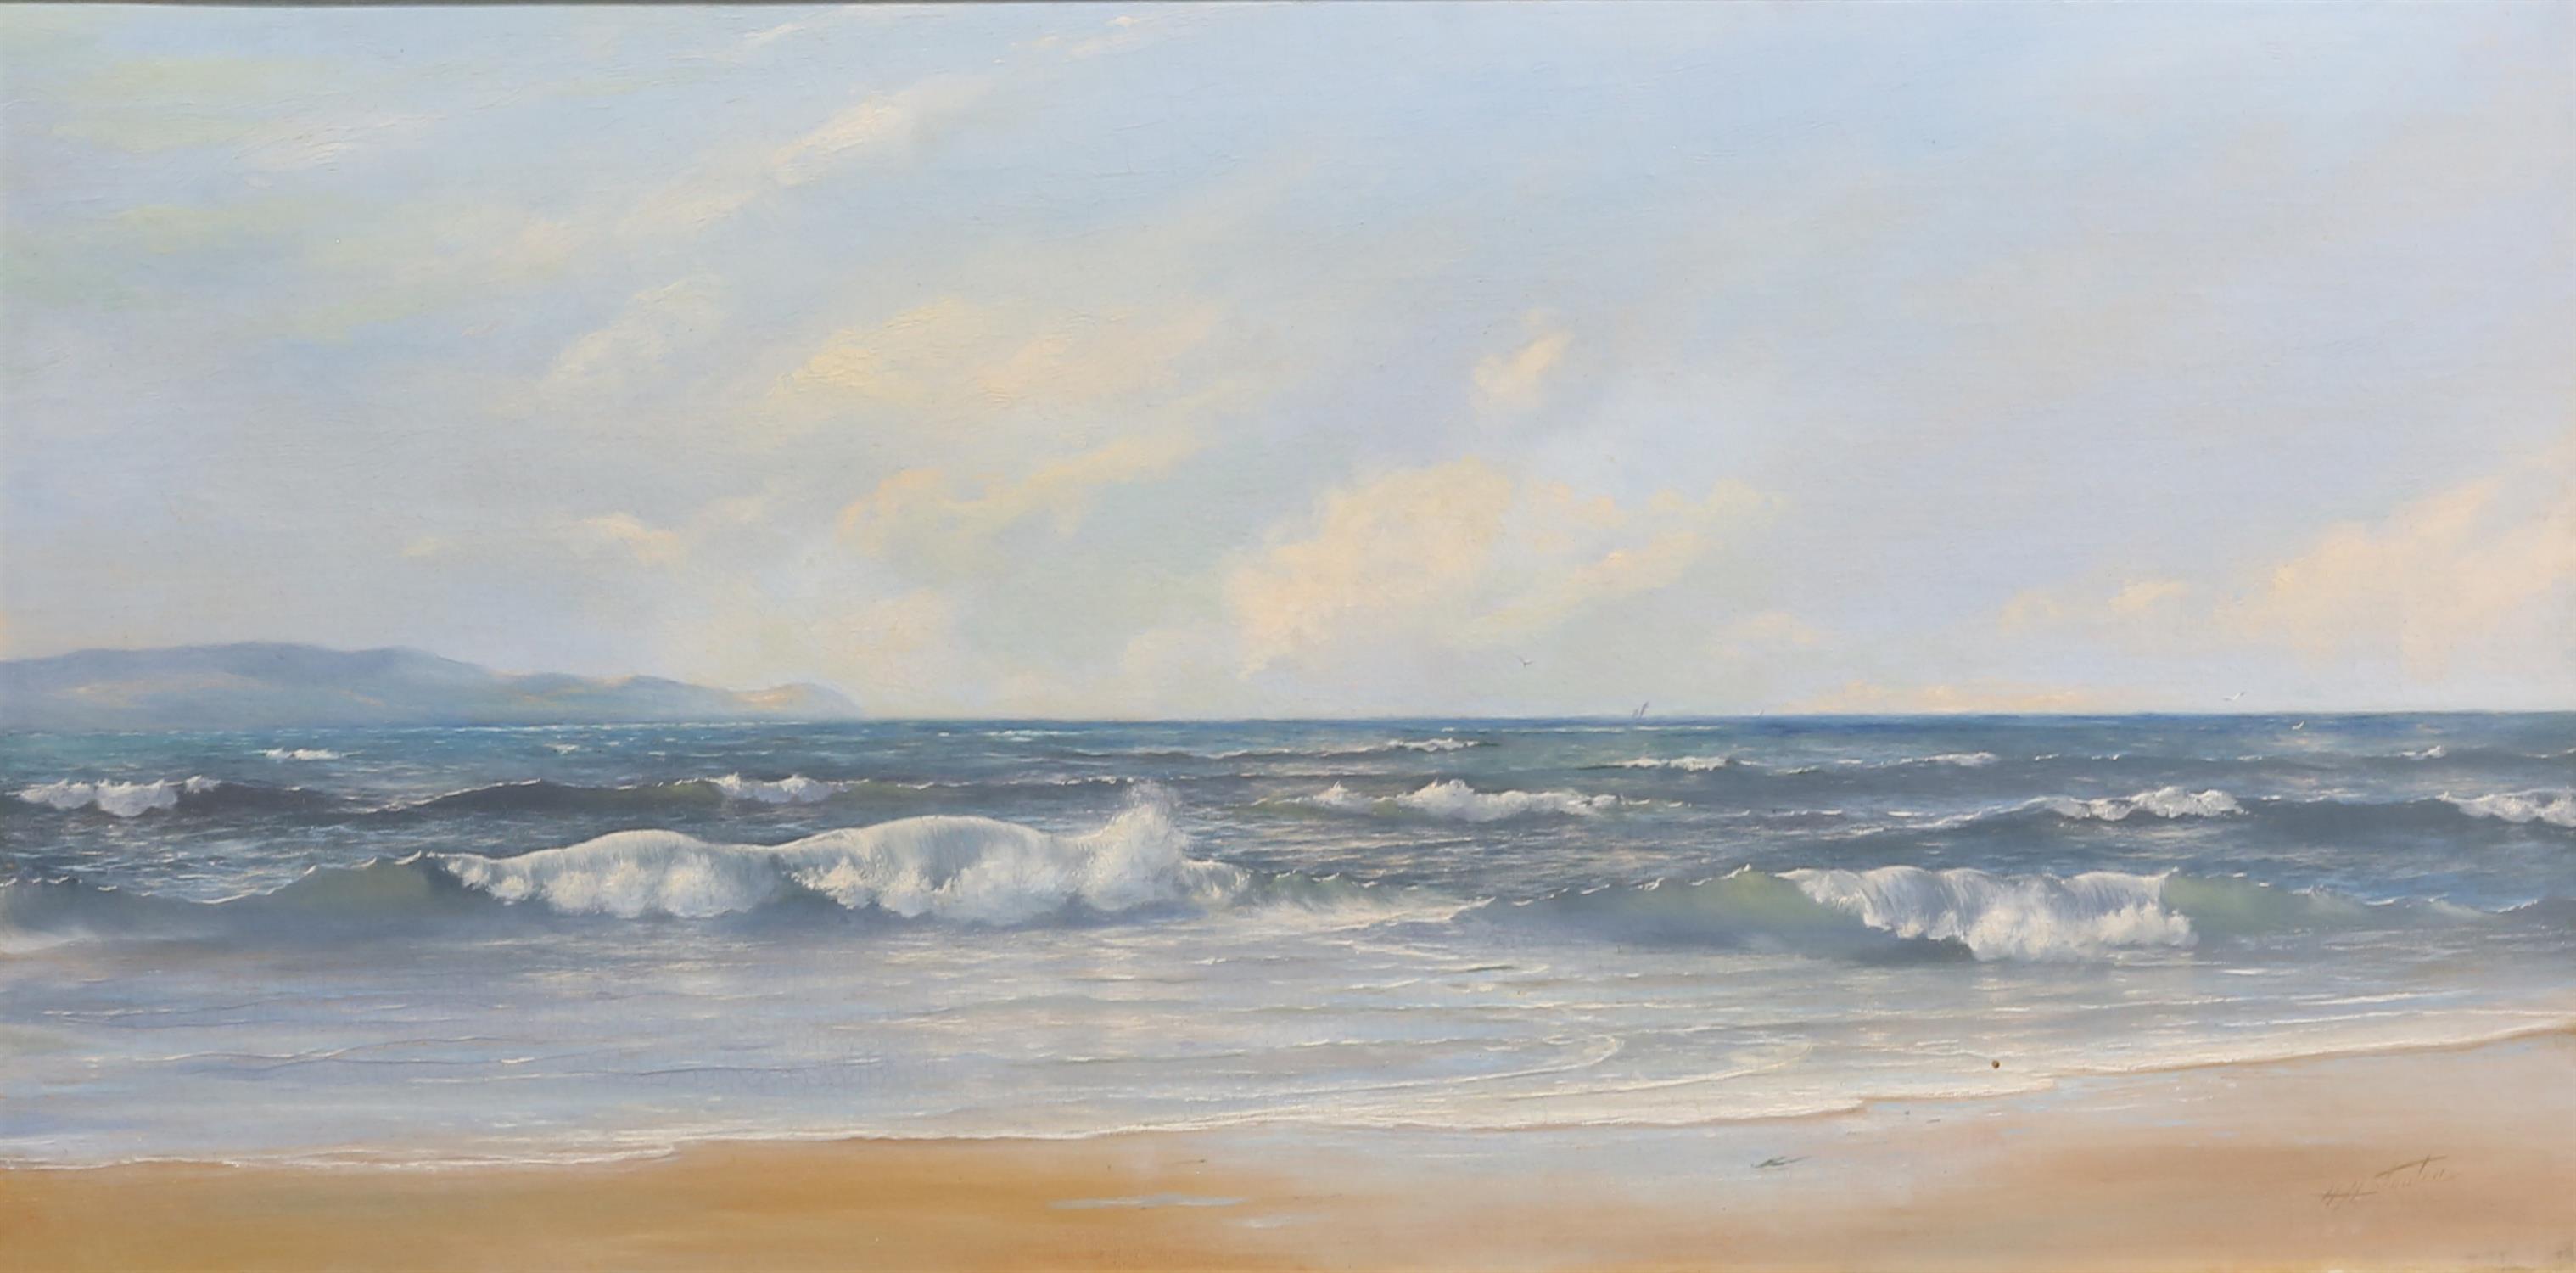 H. H. Stanton (British, twentieth century), seascape. Oil on canvas. Signed lower right. Framed.